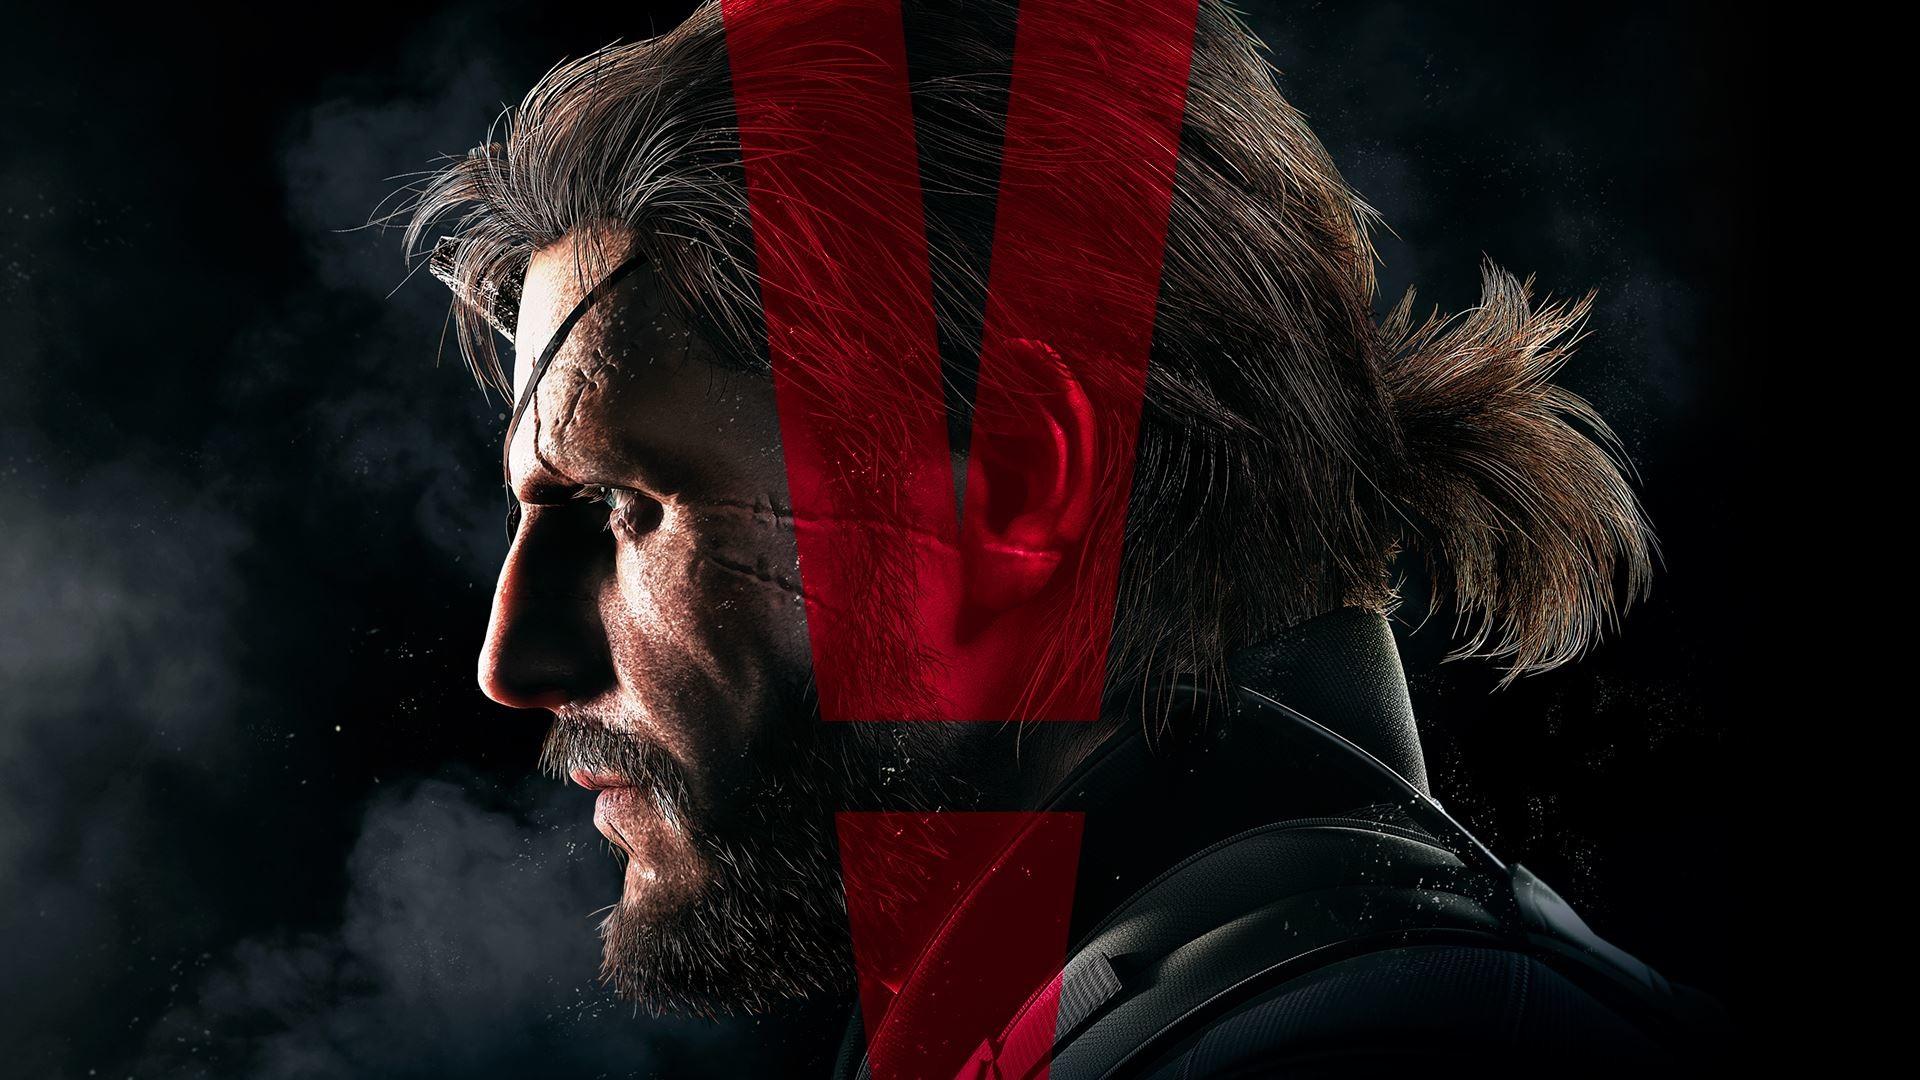 Res: 1920x1080, Metal Gear Solid 5: Phantom Pain Screenshot 1